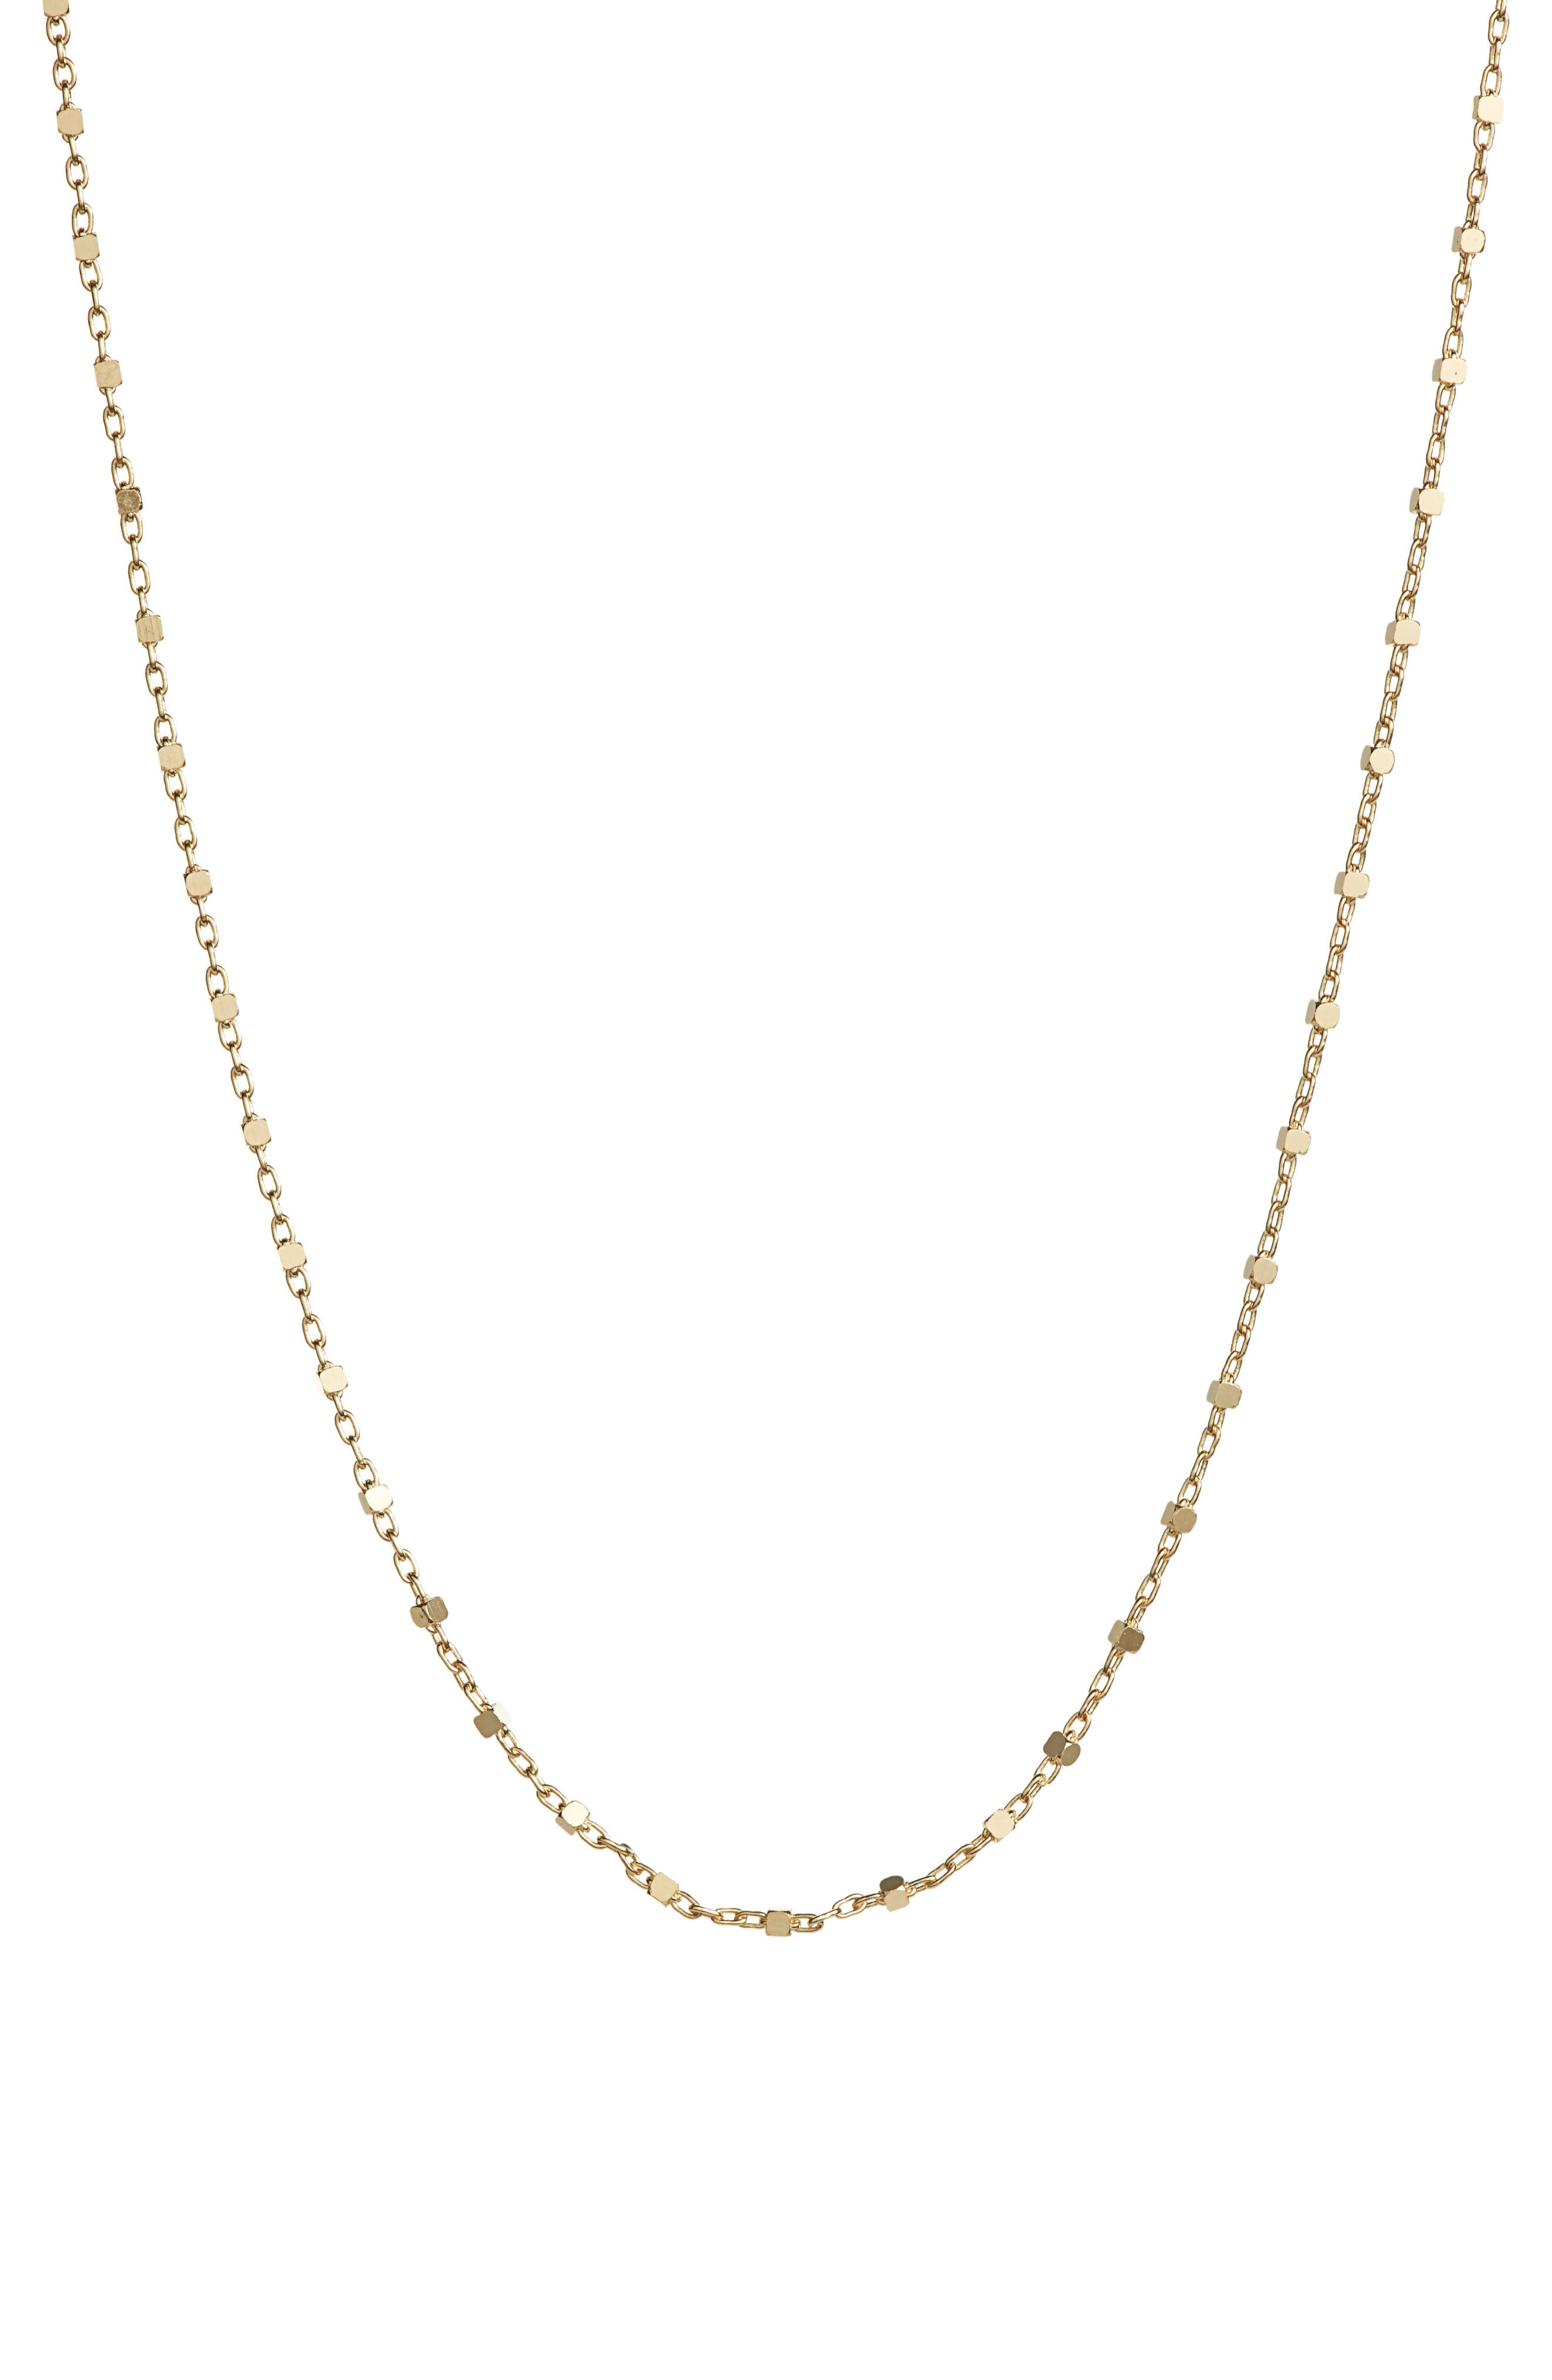 stylish 14k gold plated thin snake plain necklace choker statement double layer multi strand stacking minimal simple design fashion jewelry